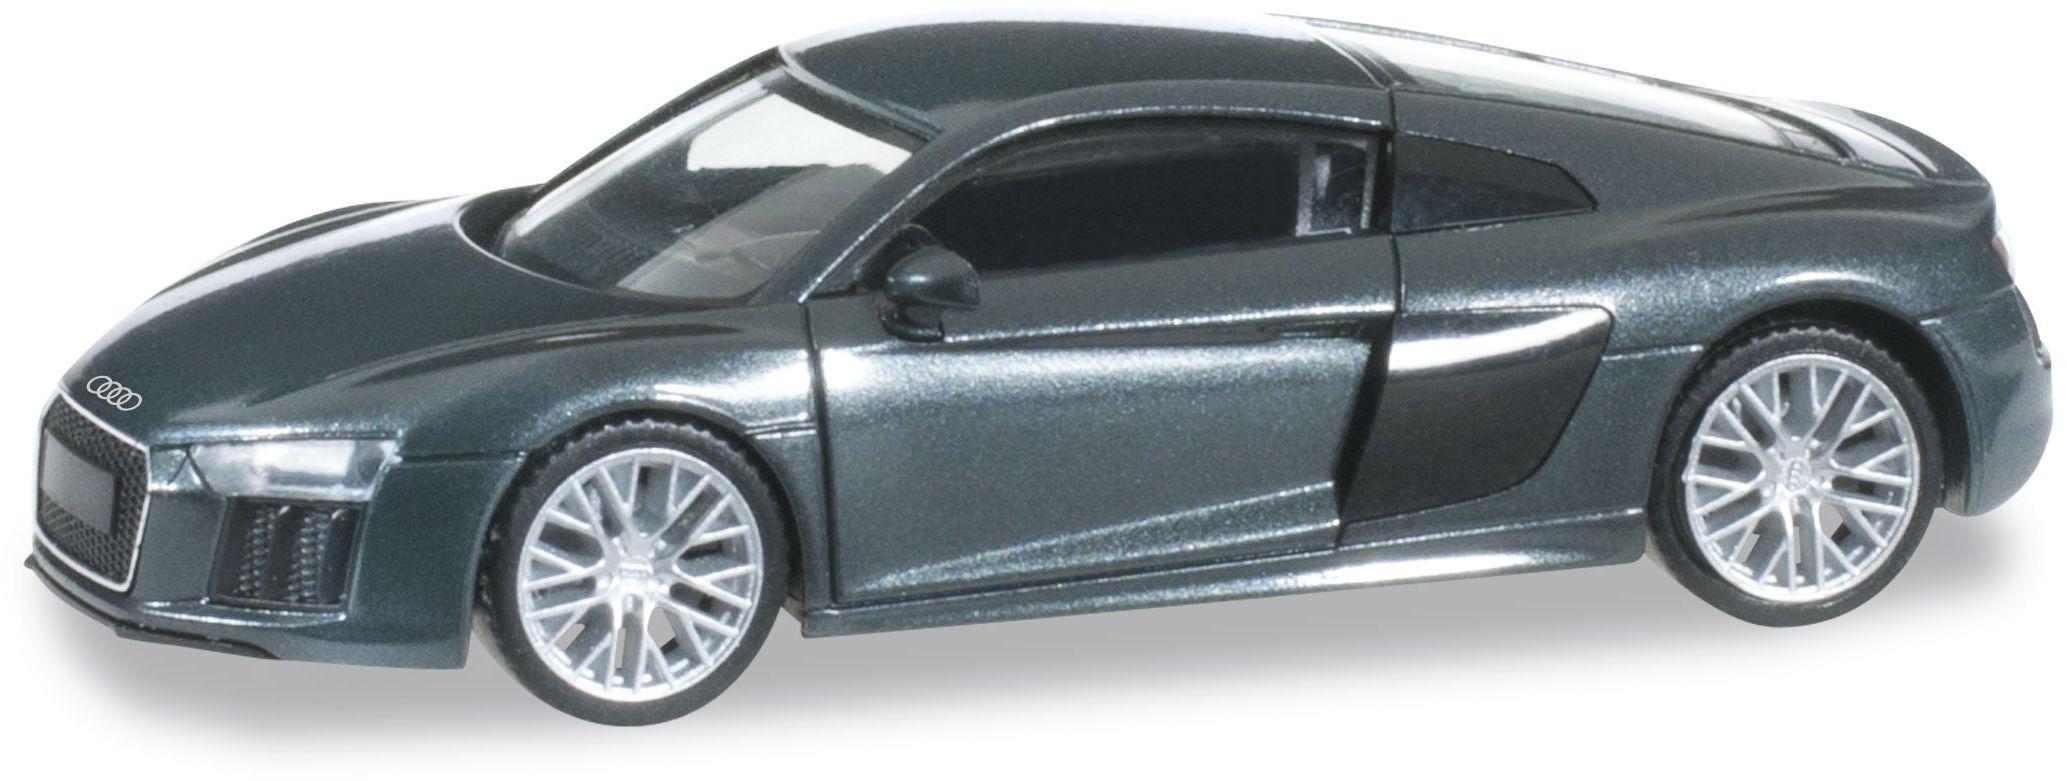 Herpa 038485 - miniaturowy model - Audi R8 V10